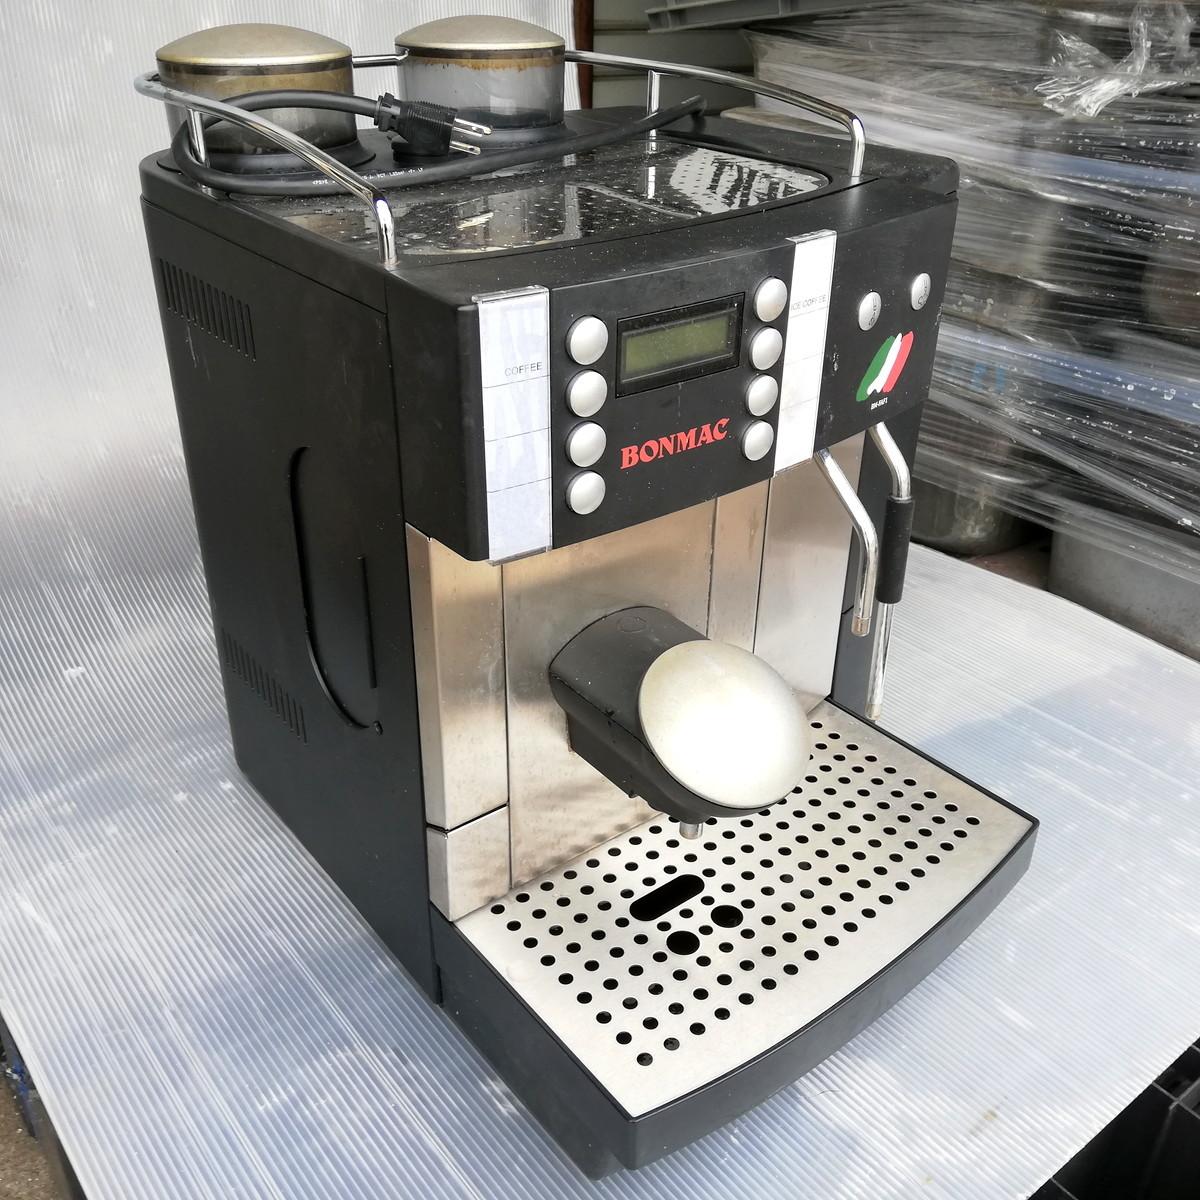 FR-1◆FRANKE フランケ Typ654 エスプレッソマシン 100V 通電確認済 コーヒーマシン / BONMAC BM-FAF1 ★引取歓迎(大阪)_画像2